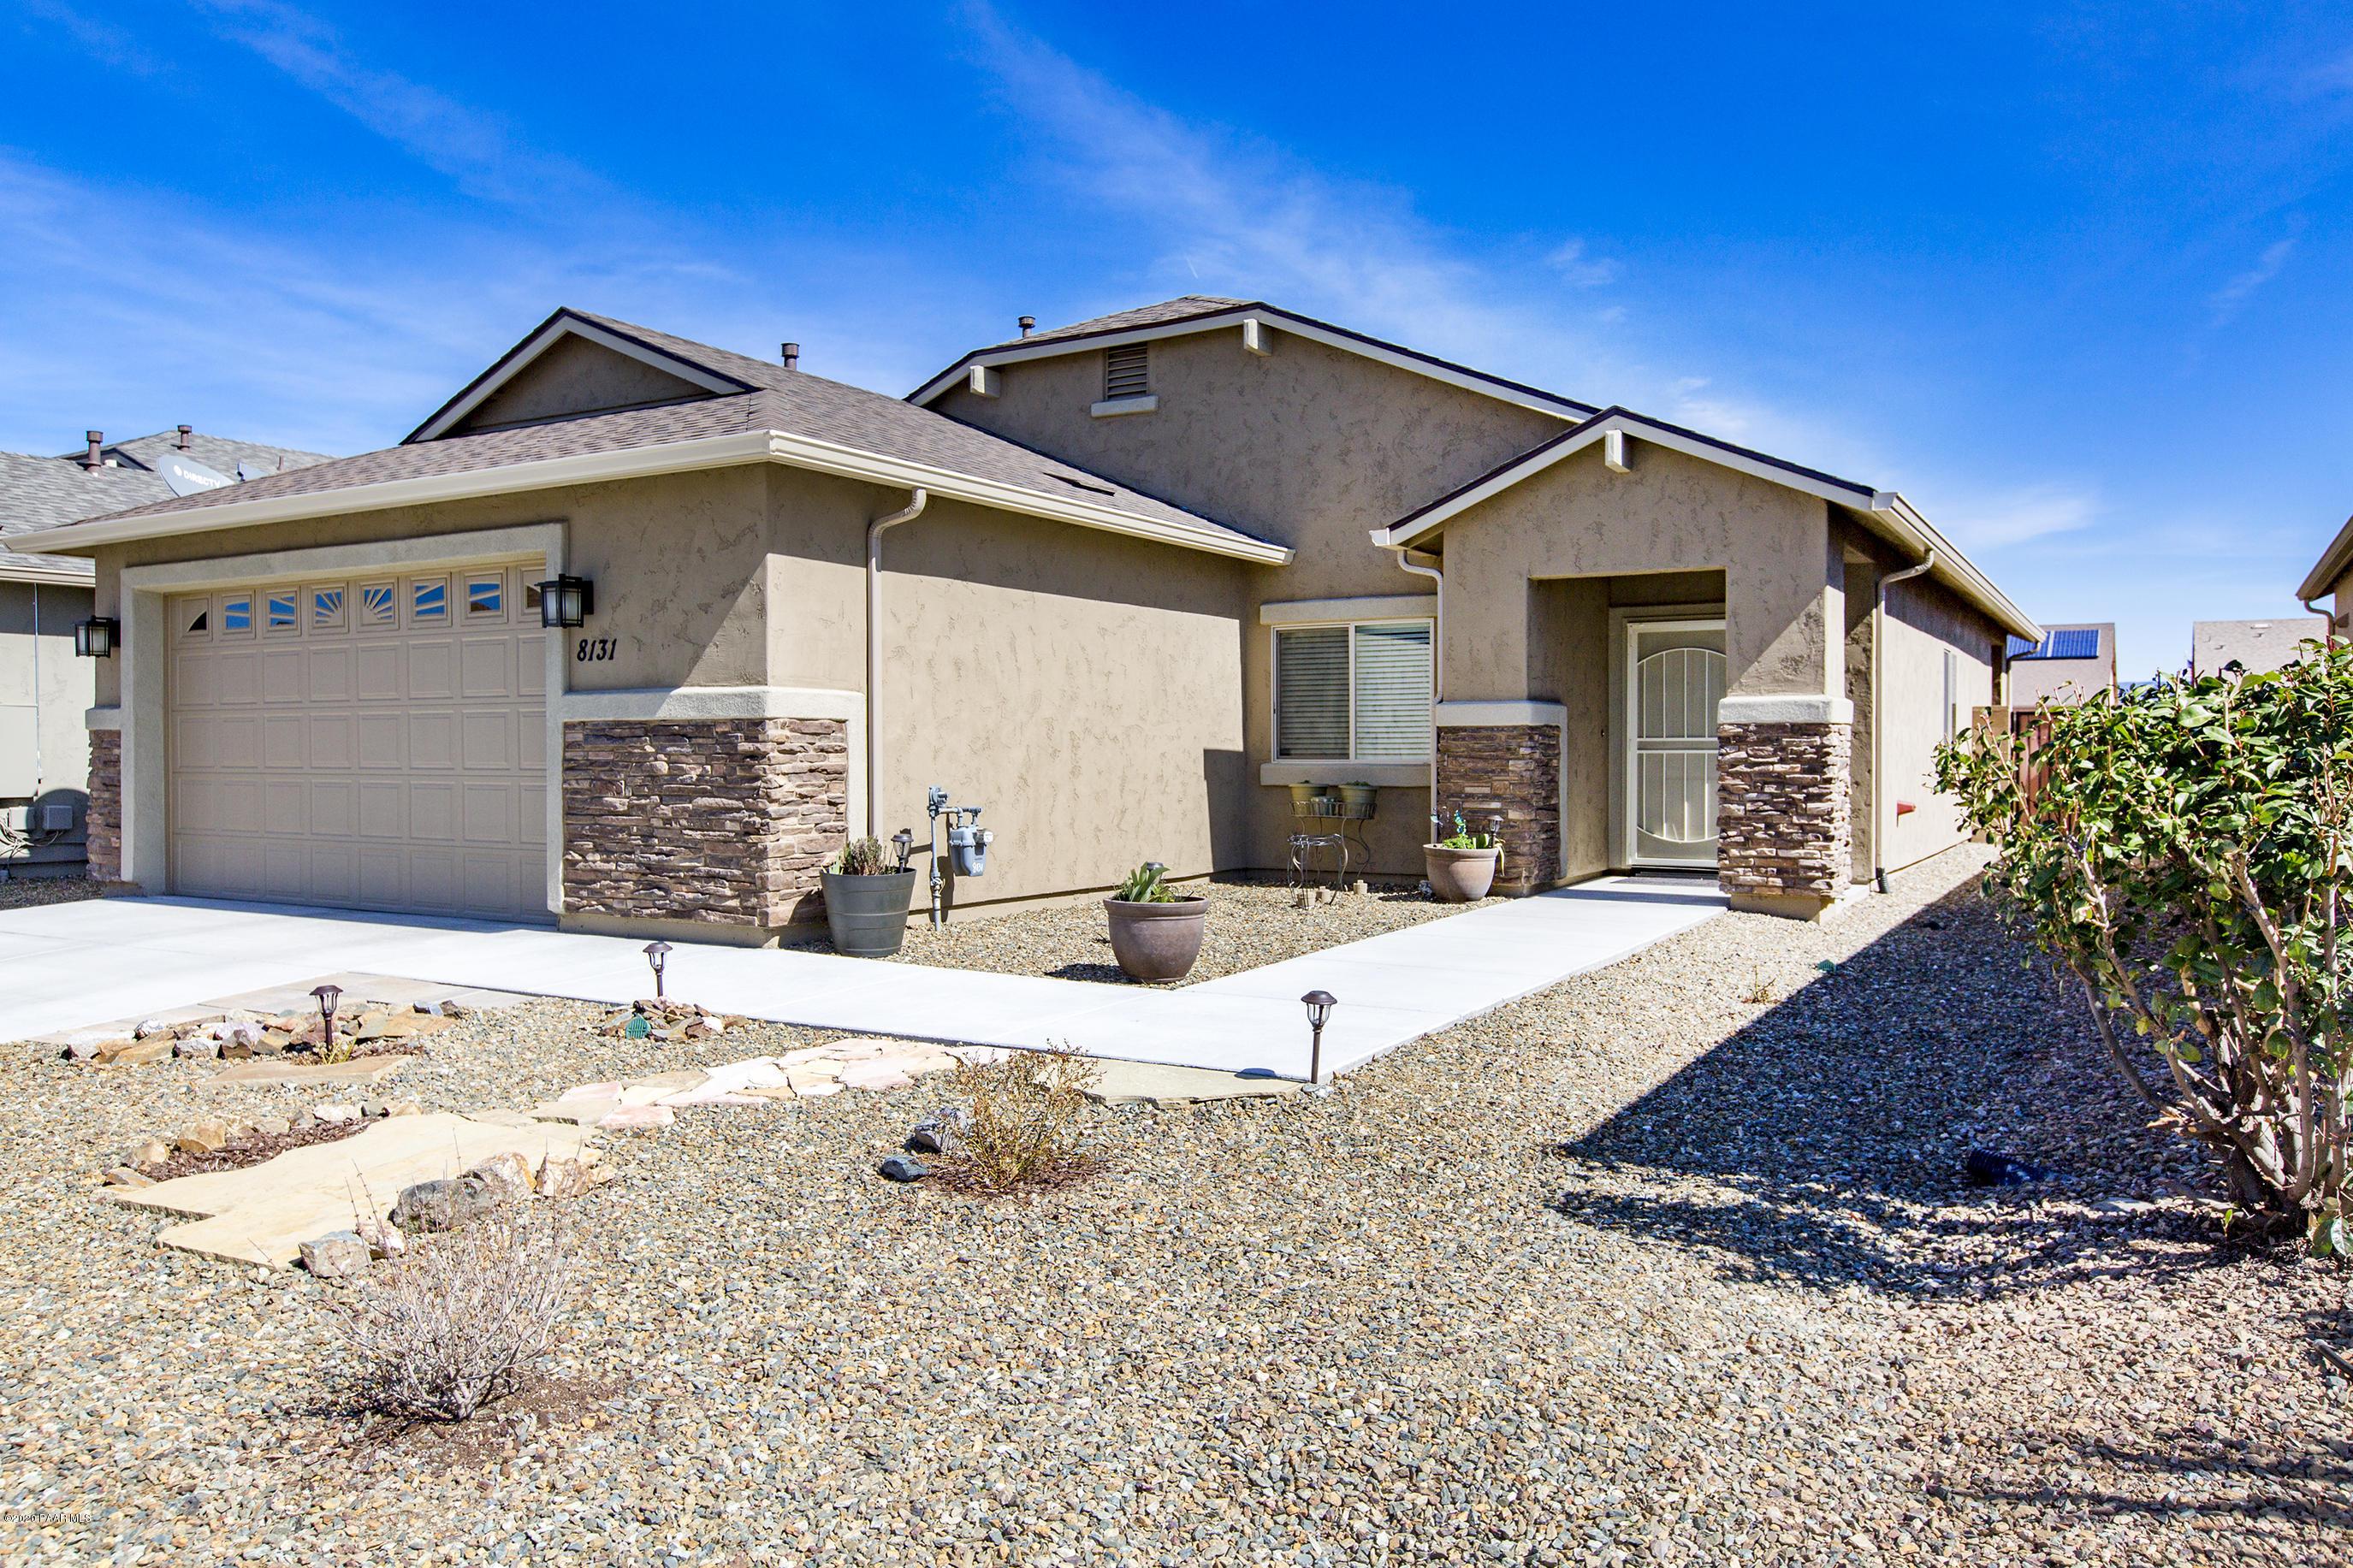 8131 N Racehorse Road, Prescott Valley in Yavapai County, AZ 86315 Home for Sale